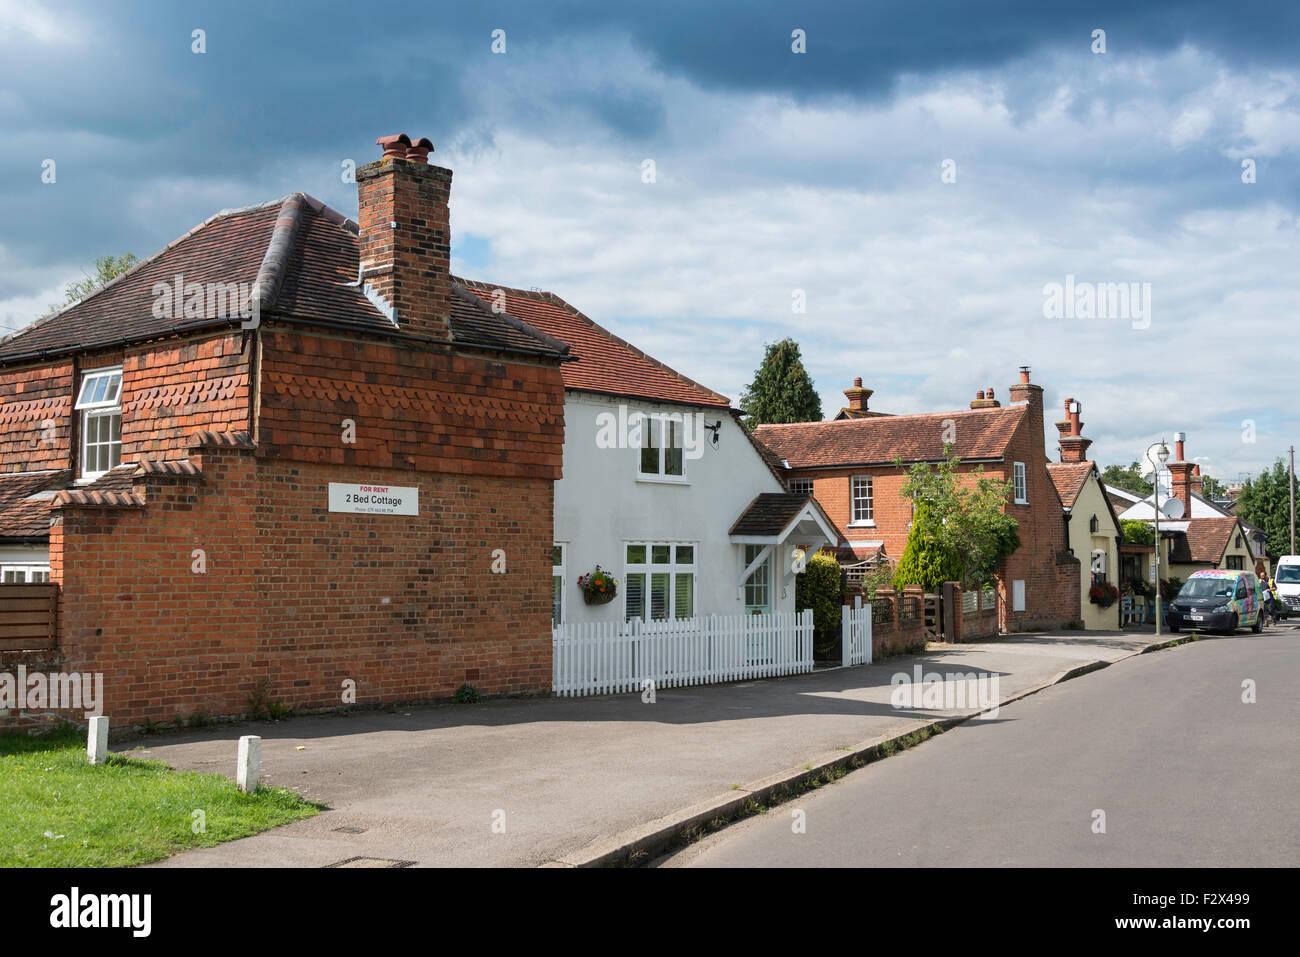 Cottages and Running Mare Freehouse Pub & Restaurant, Tilt Green, Cobham, Surrey, England, United Kingdom - Stock Image